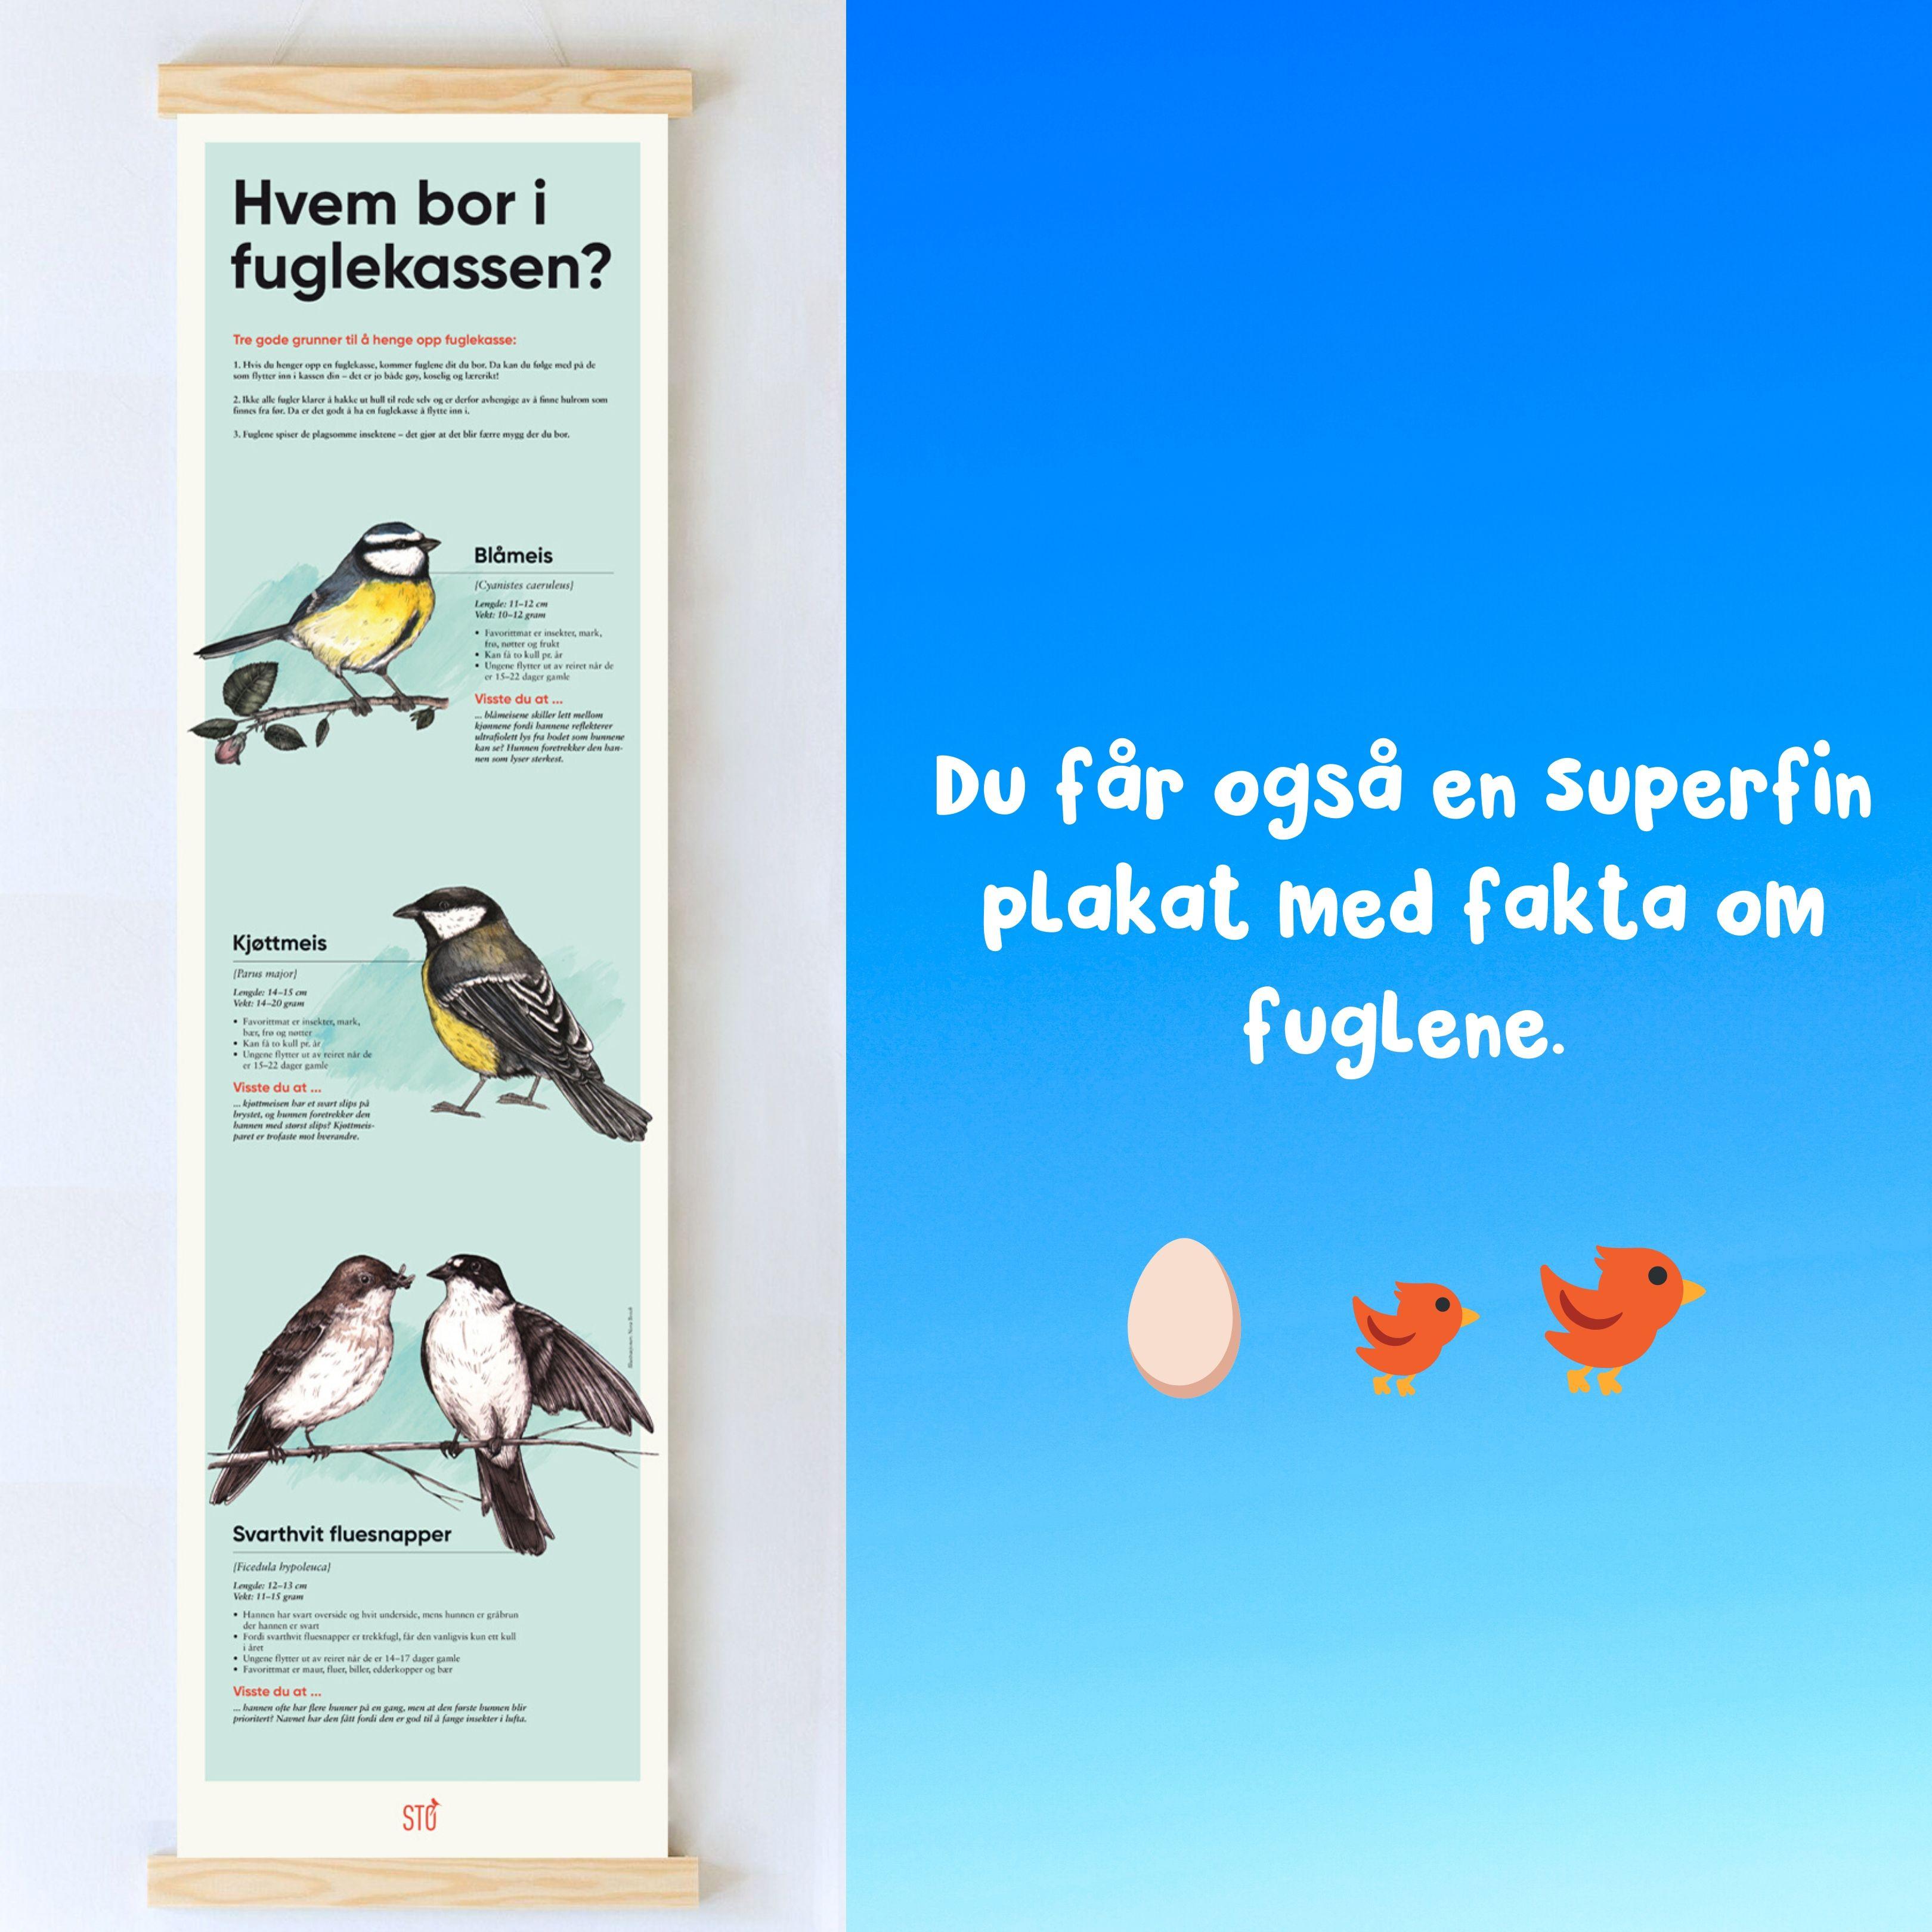 Stø Fuglekasse